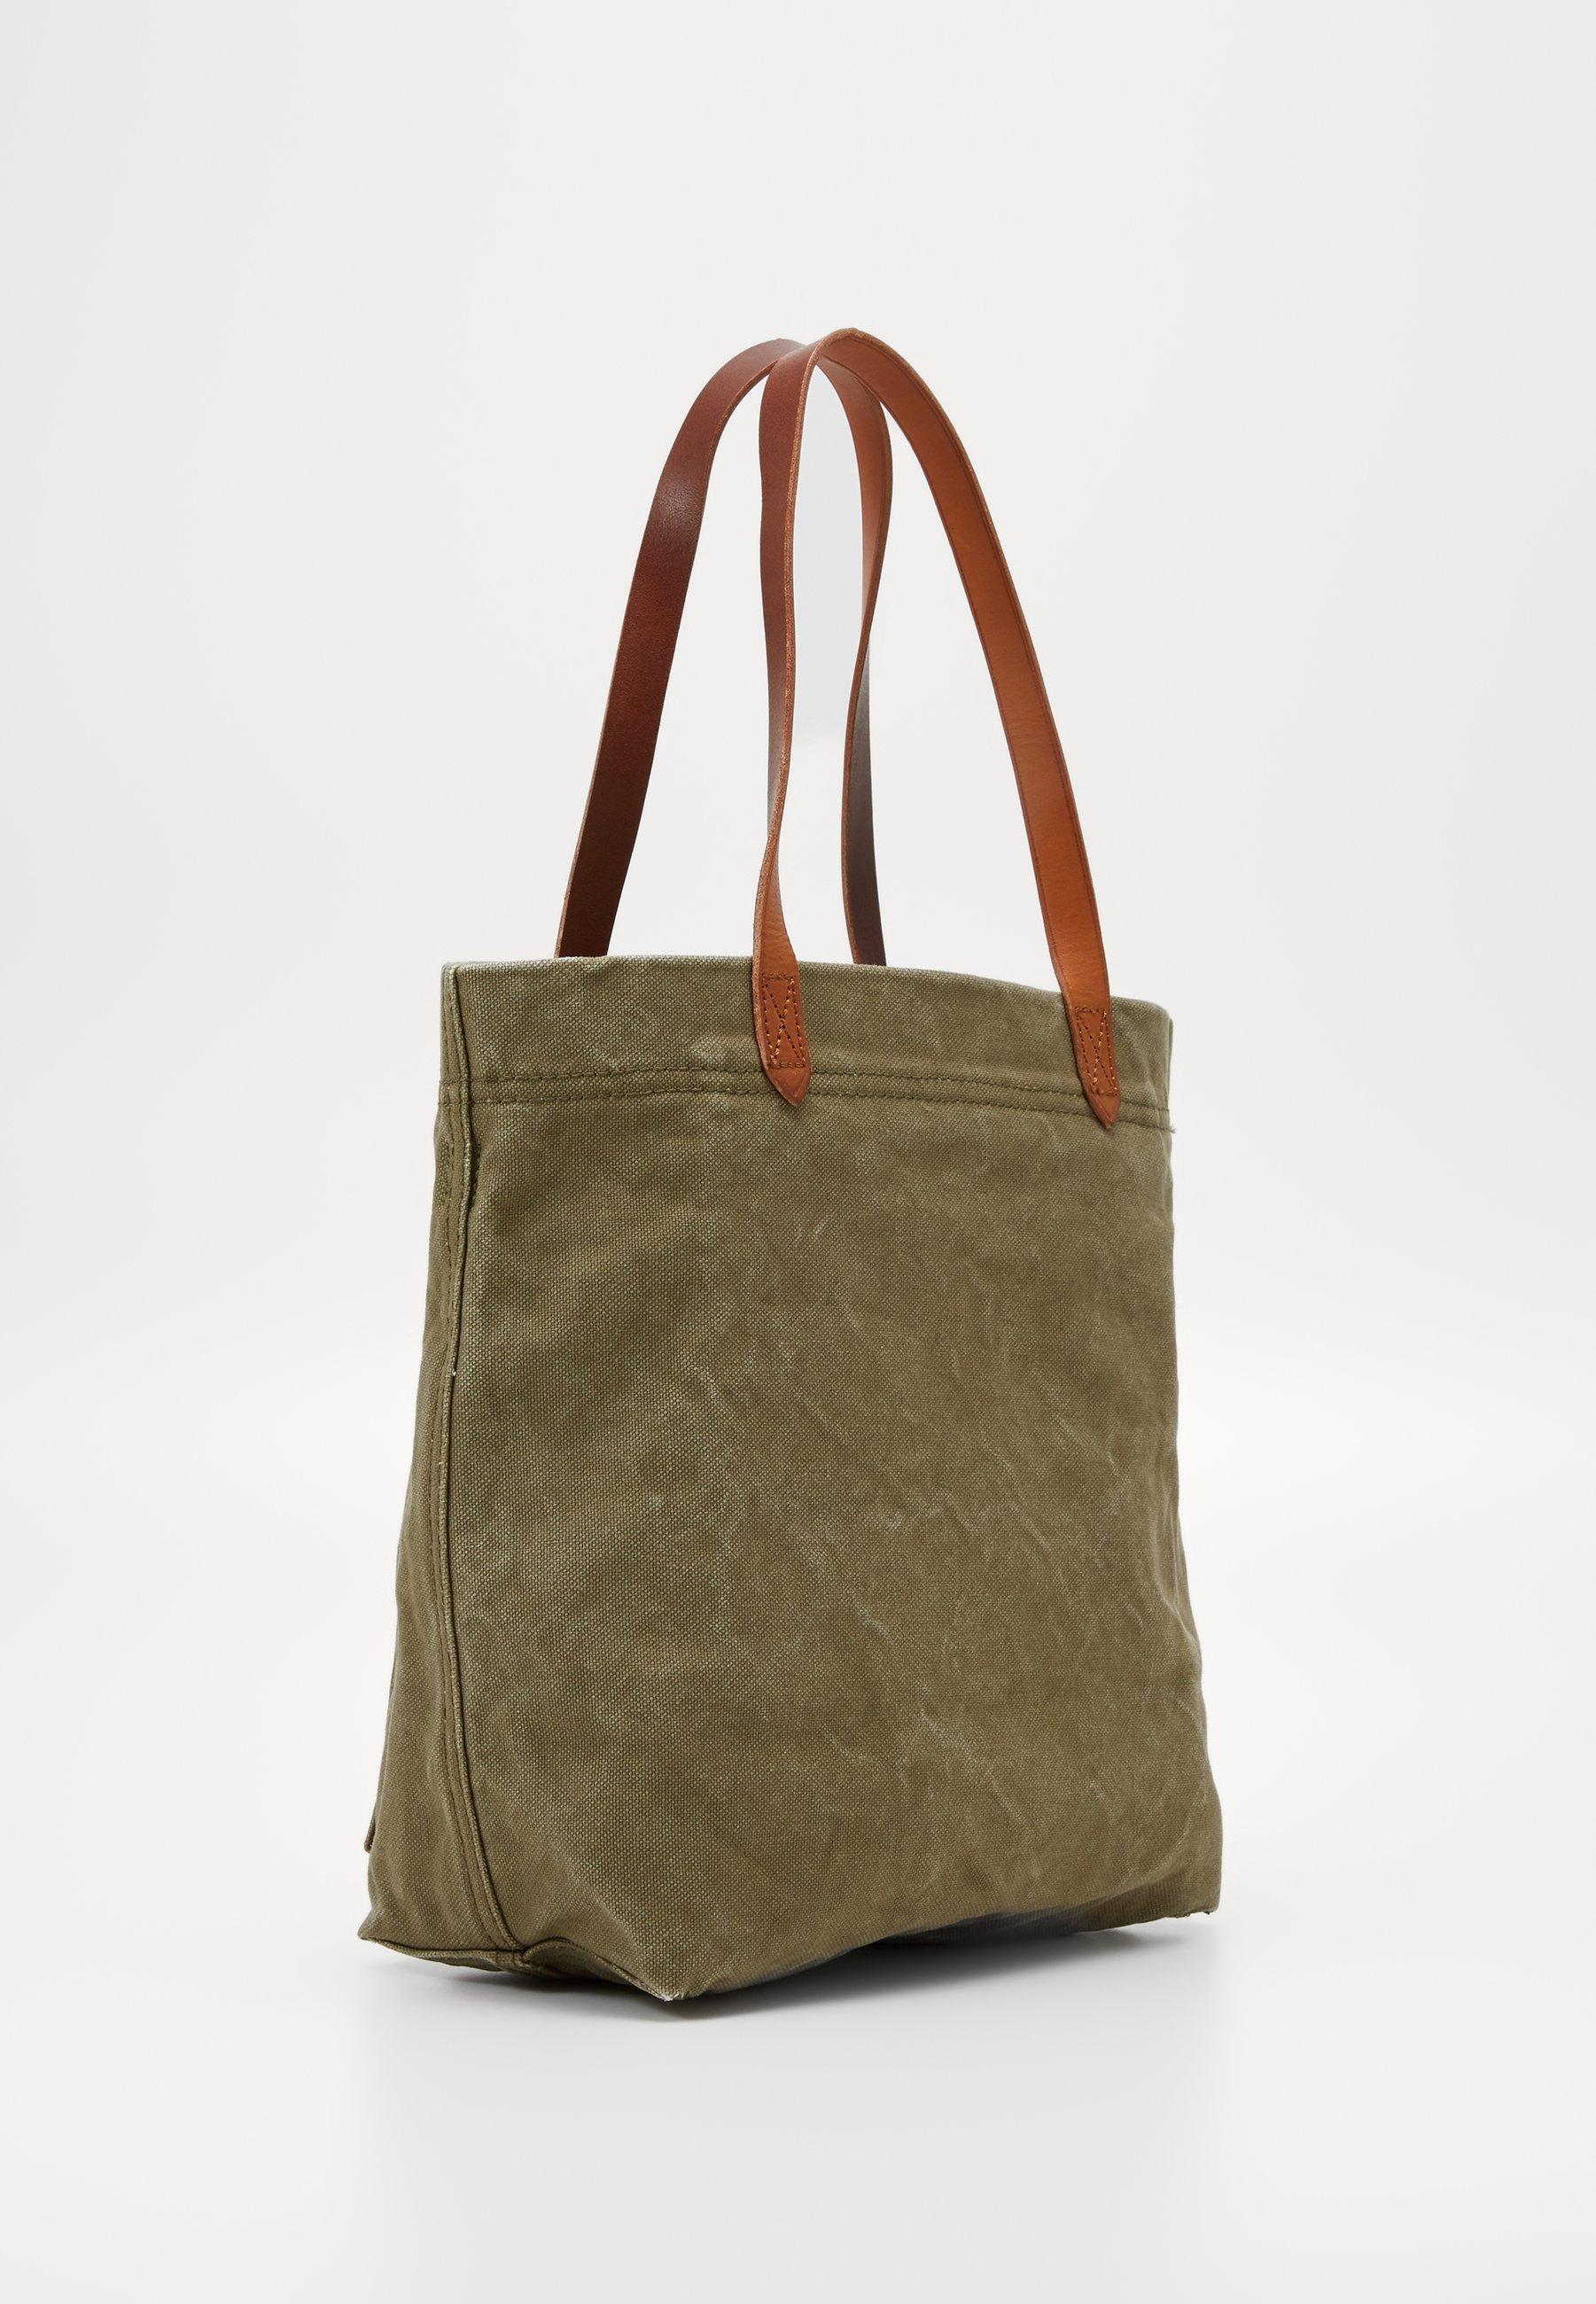 Madewell The Medium Transport Tote - Shopping Bag British Surplus/khaki